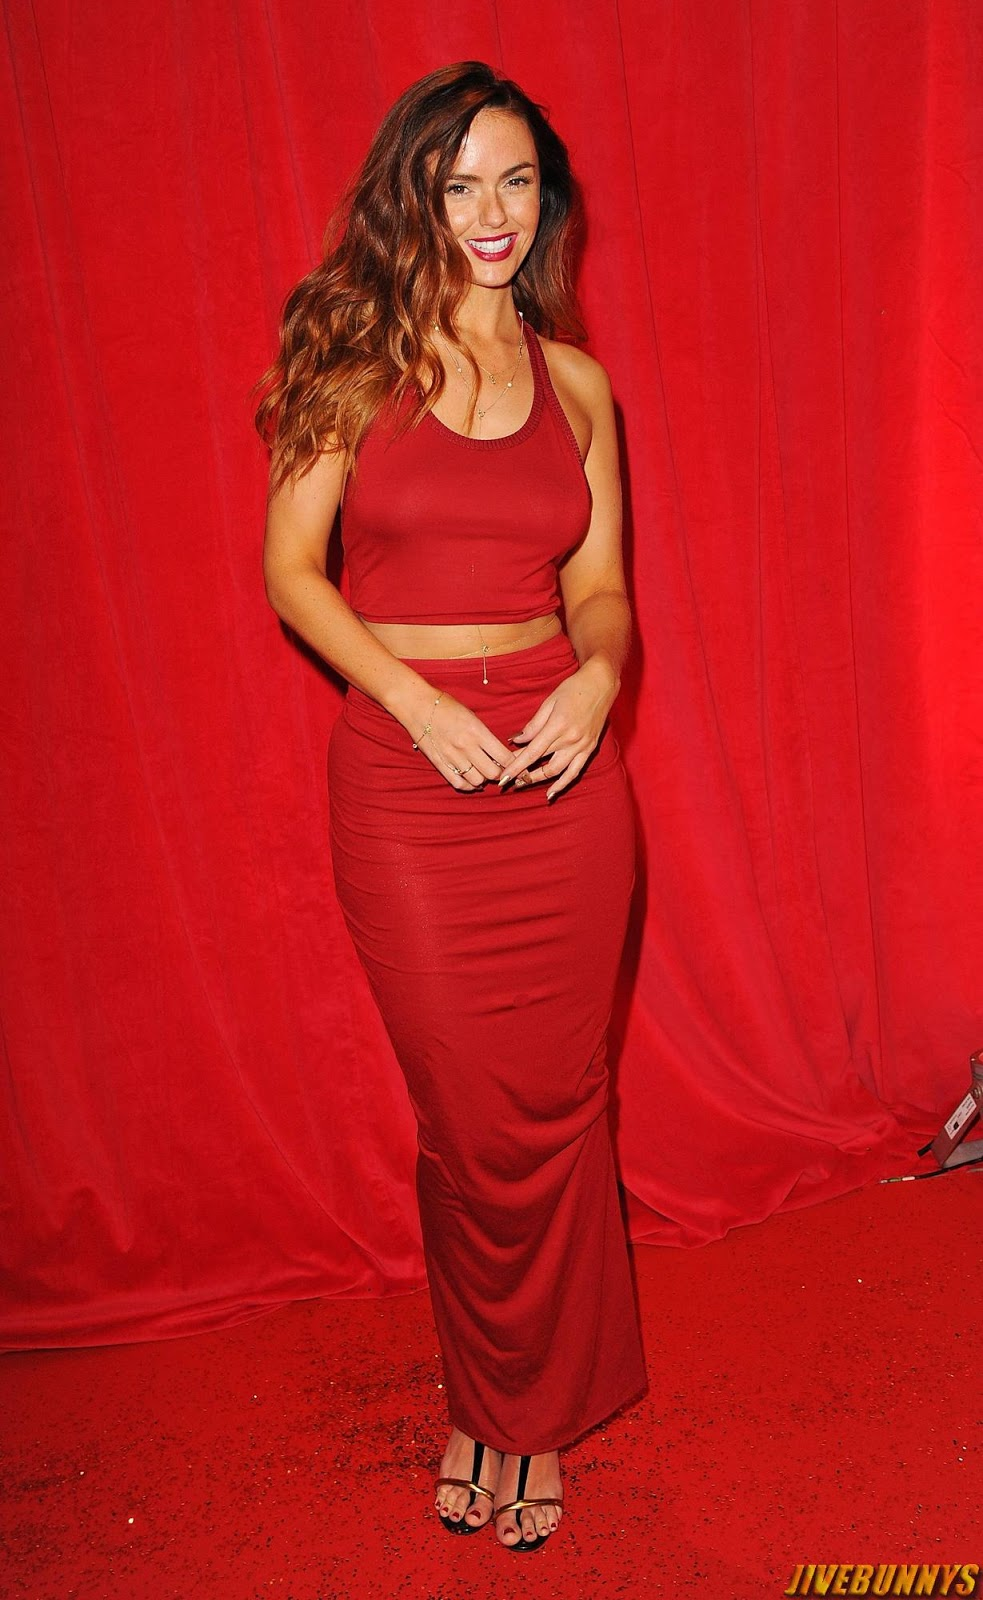 British Soap Awards 2014 in London - May 24, 2014